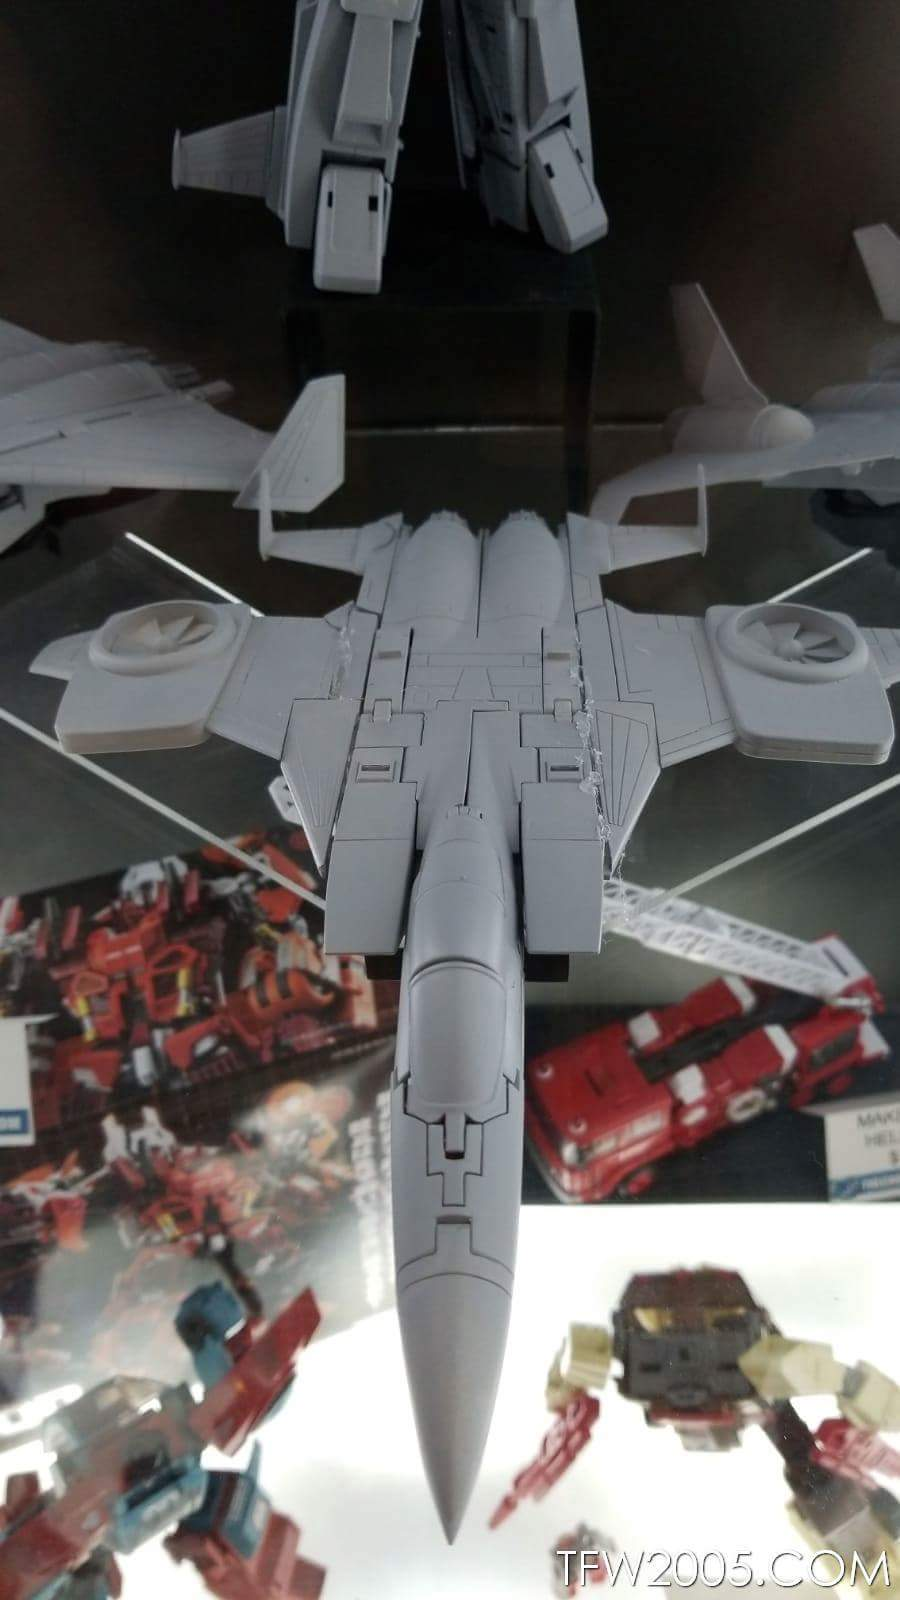 [Maketoys] Produit Tiers - Jouets MTRM-15 Endgame (aka Dirge/Funébro), MTRM-16 Jetstream (aka Thrust/Fatalo) & MTRM-17 Booster (aka Ramjet/Statoréacto) NVyNNts5_o